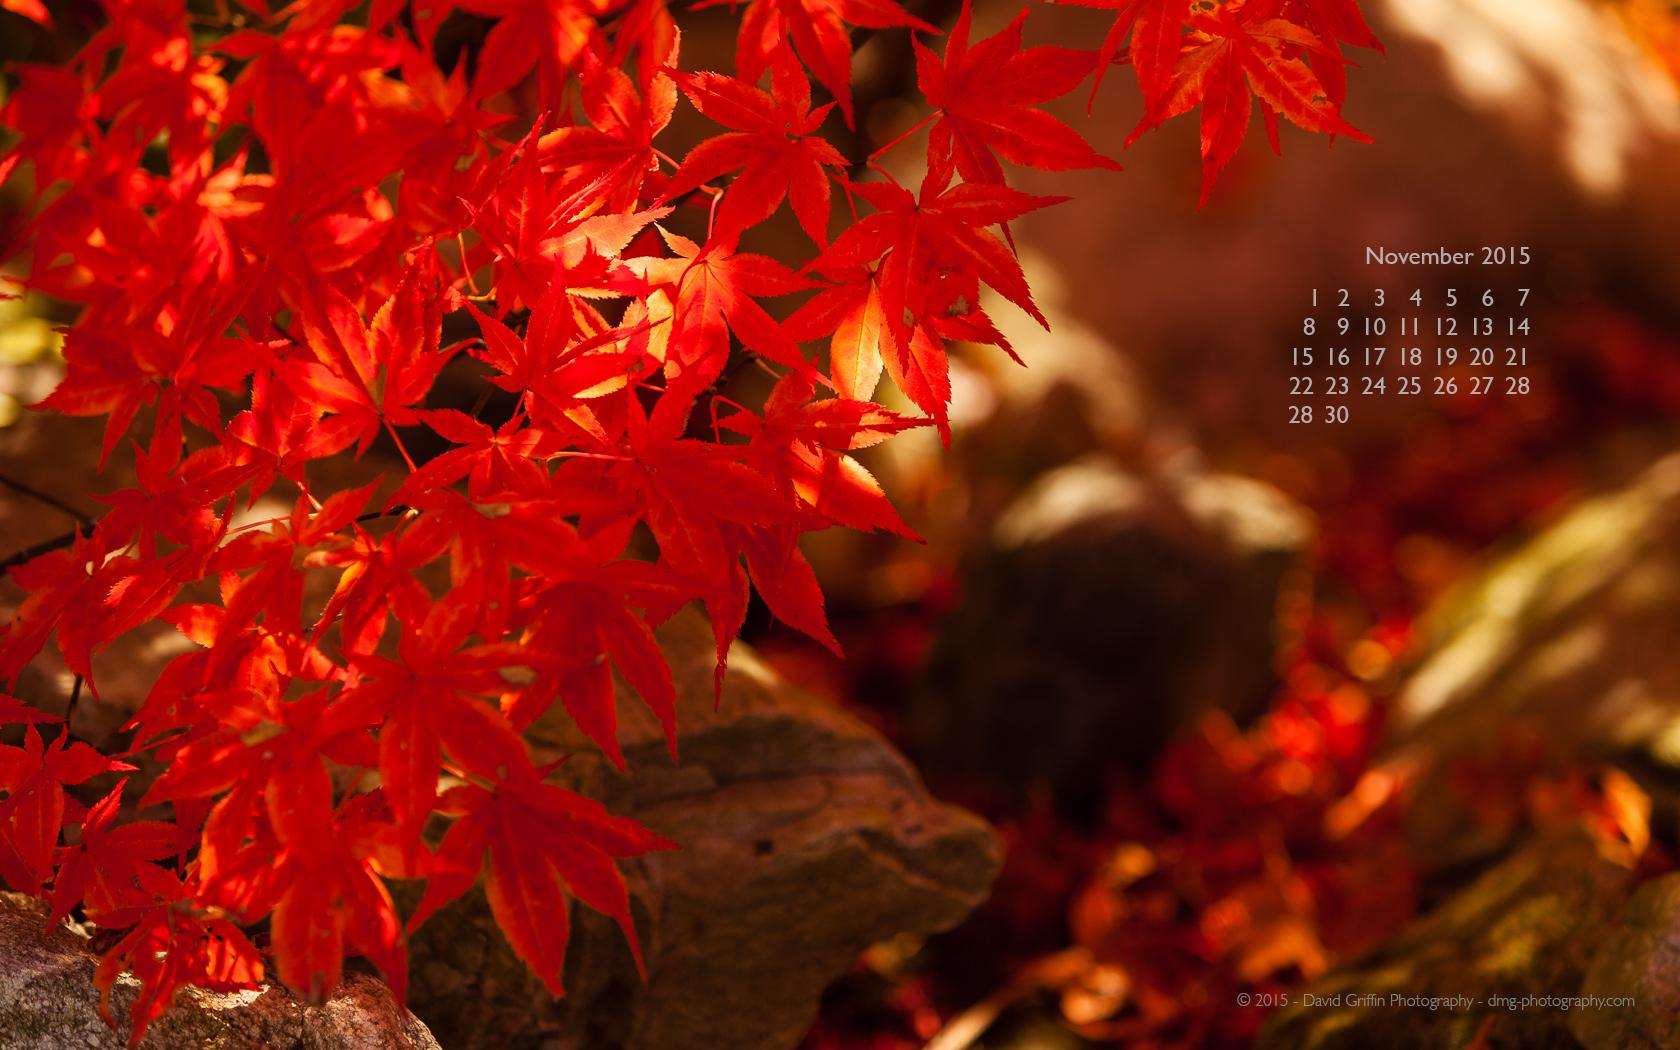 November 2015 Wallpaper David Griffin Photography 1680x1050